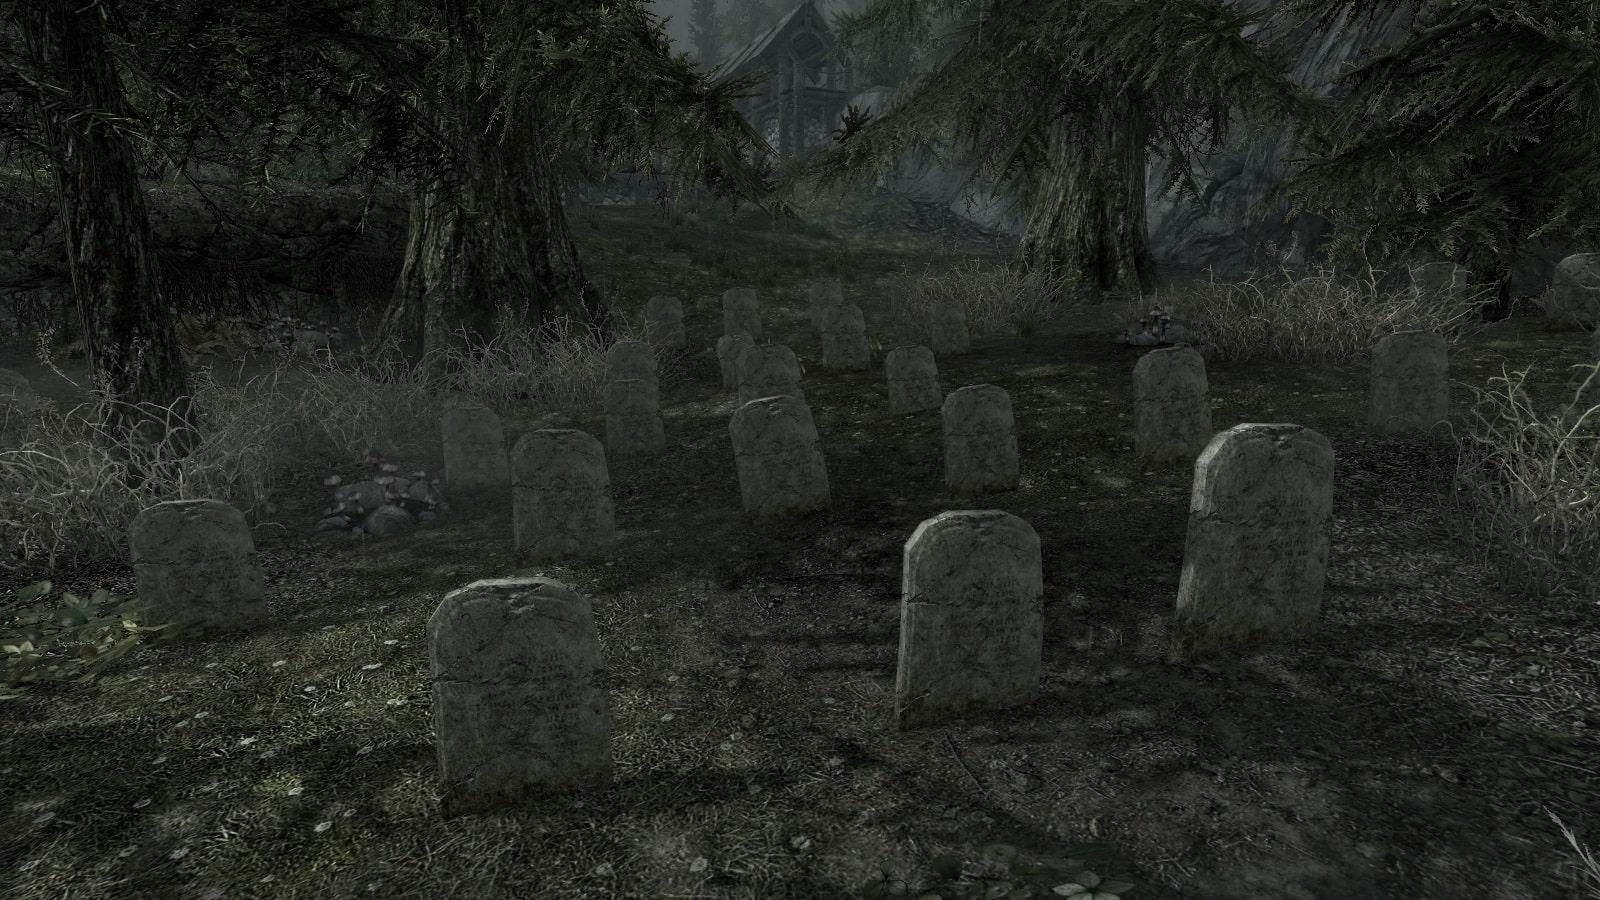 Haunting and Mourning Призраки и Скорбь